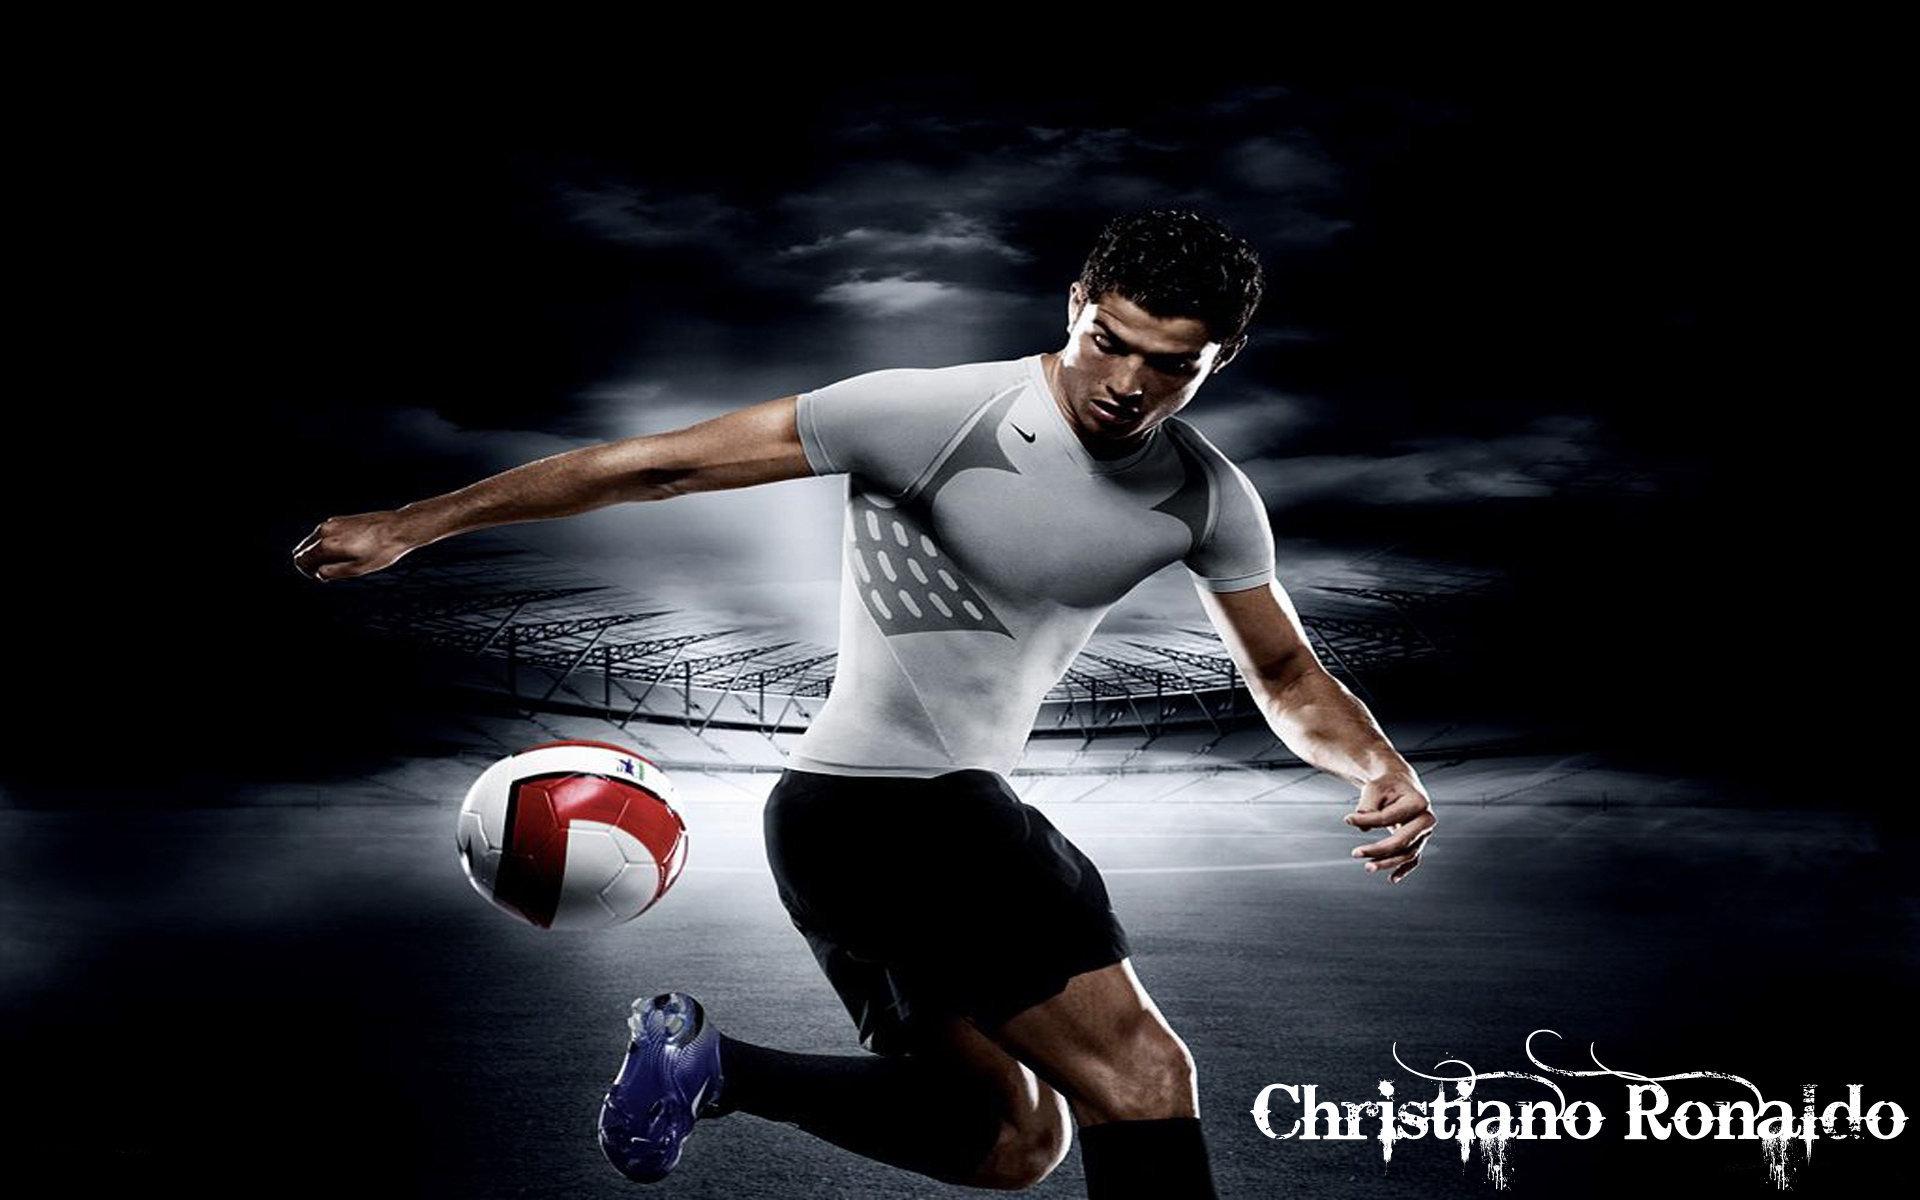 Cristiano Ronaldo Exclusive HD Wallpapers 2035 1920x1200